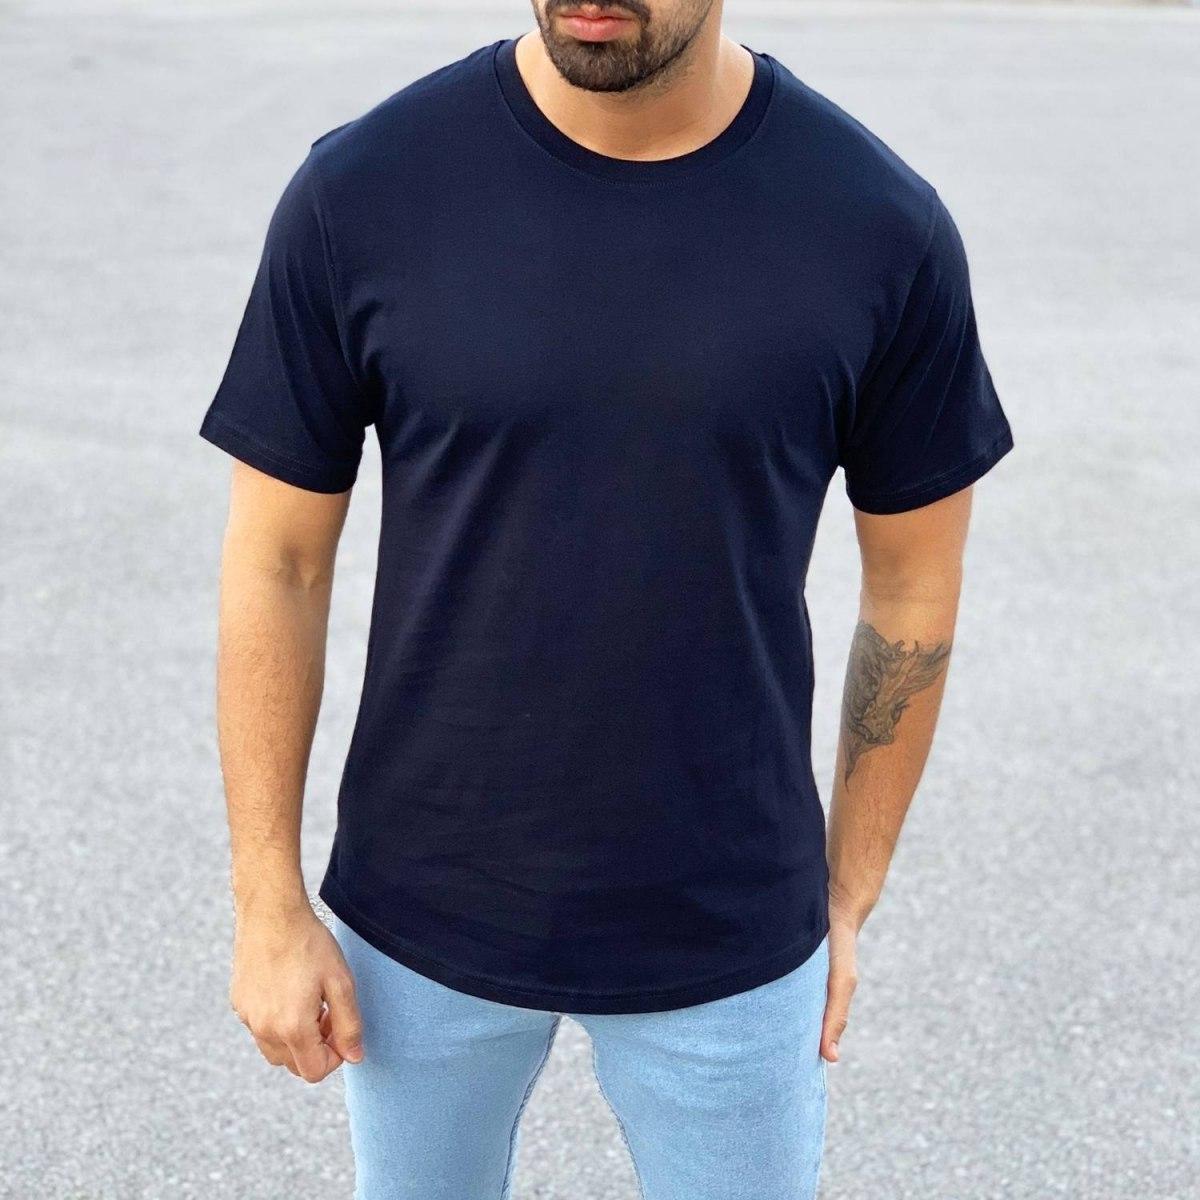 Men's Basic Round Neck T-Shirt In New Navy